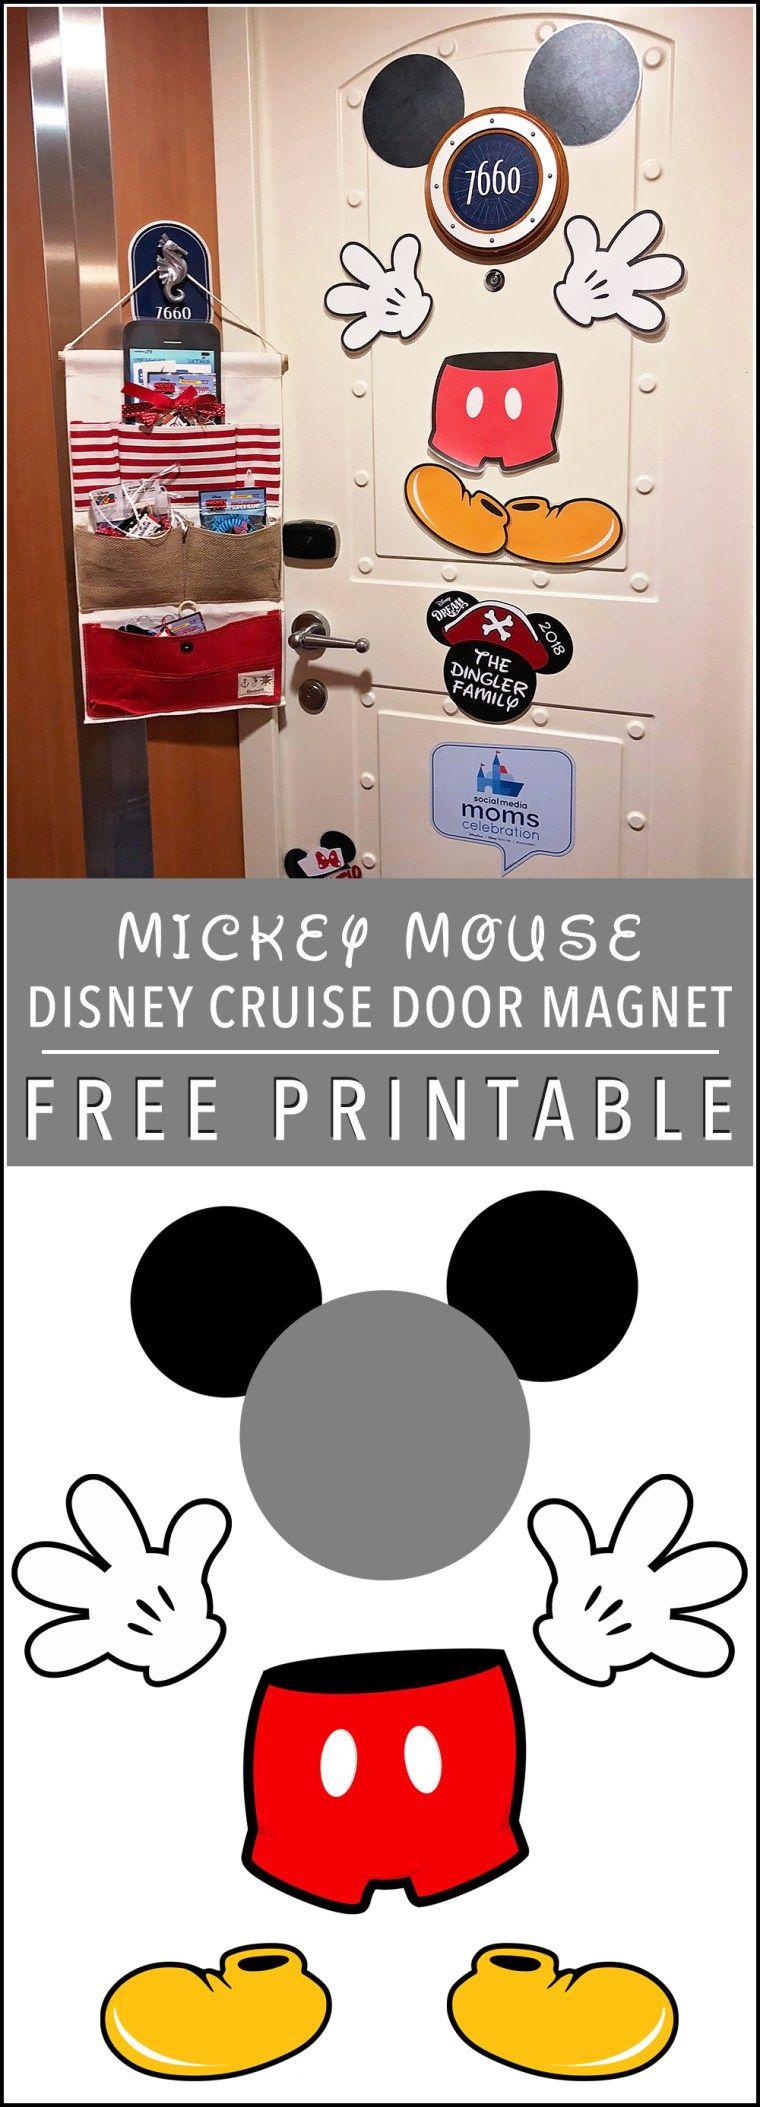 Mickey Mouse Door Magnet Free Printable Disney Cruise Line Disneysmmc Disney Cruise Door Disney Dream Cruise Disney Cruise Door Magnets